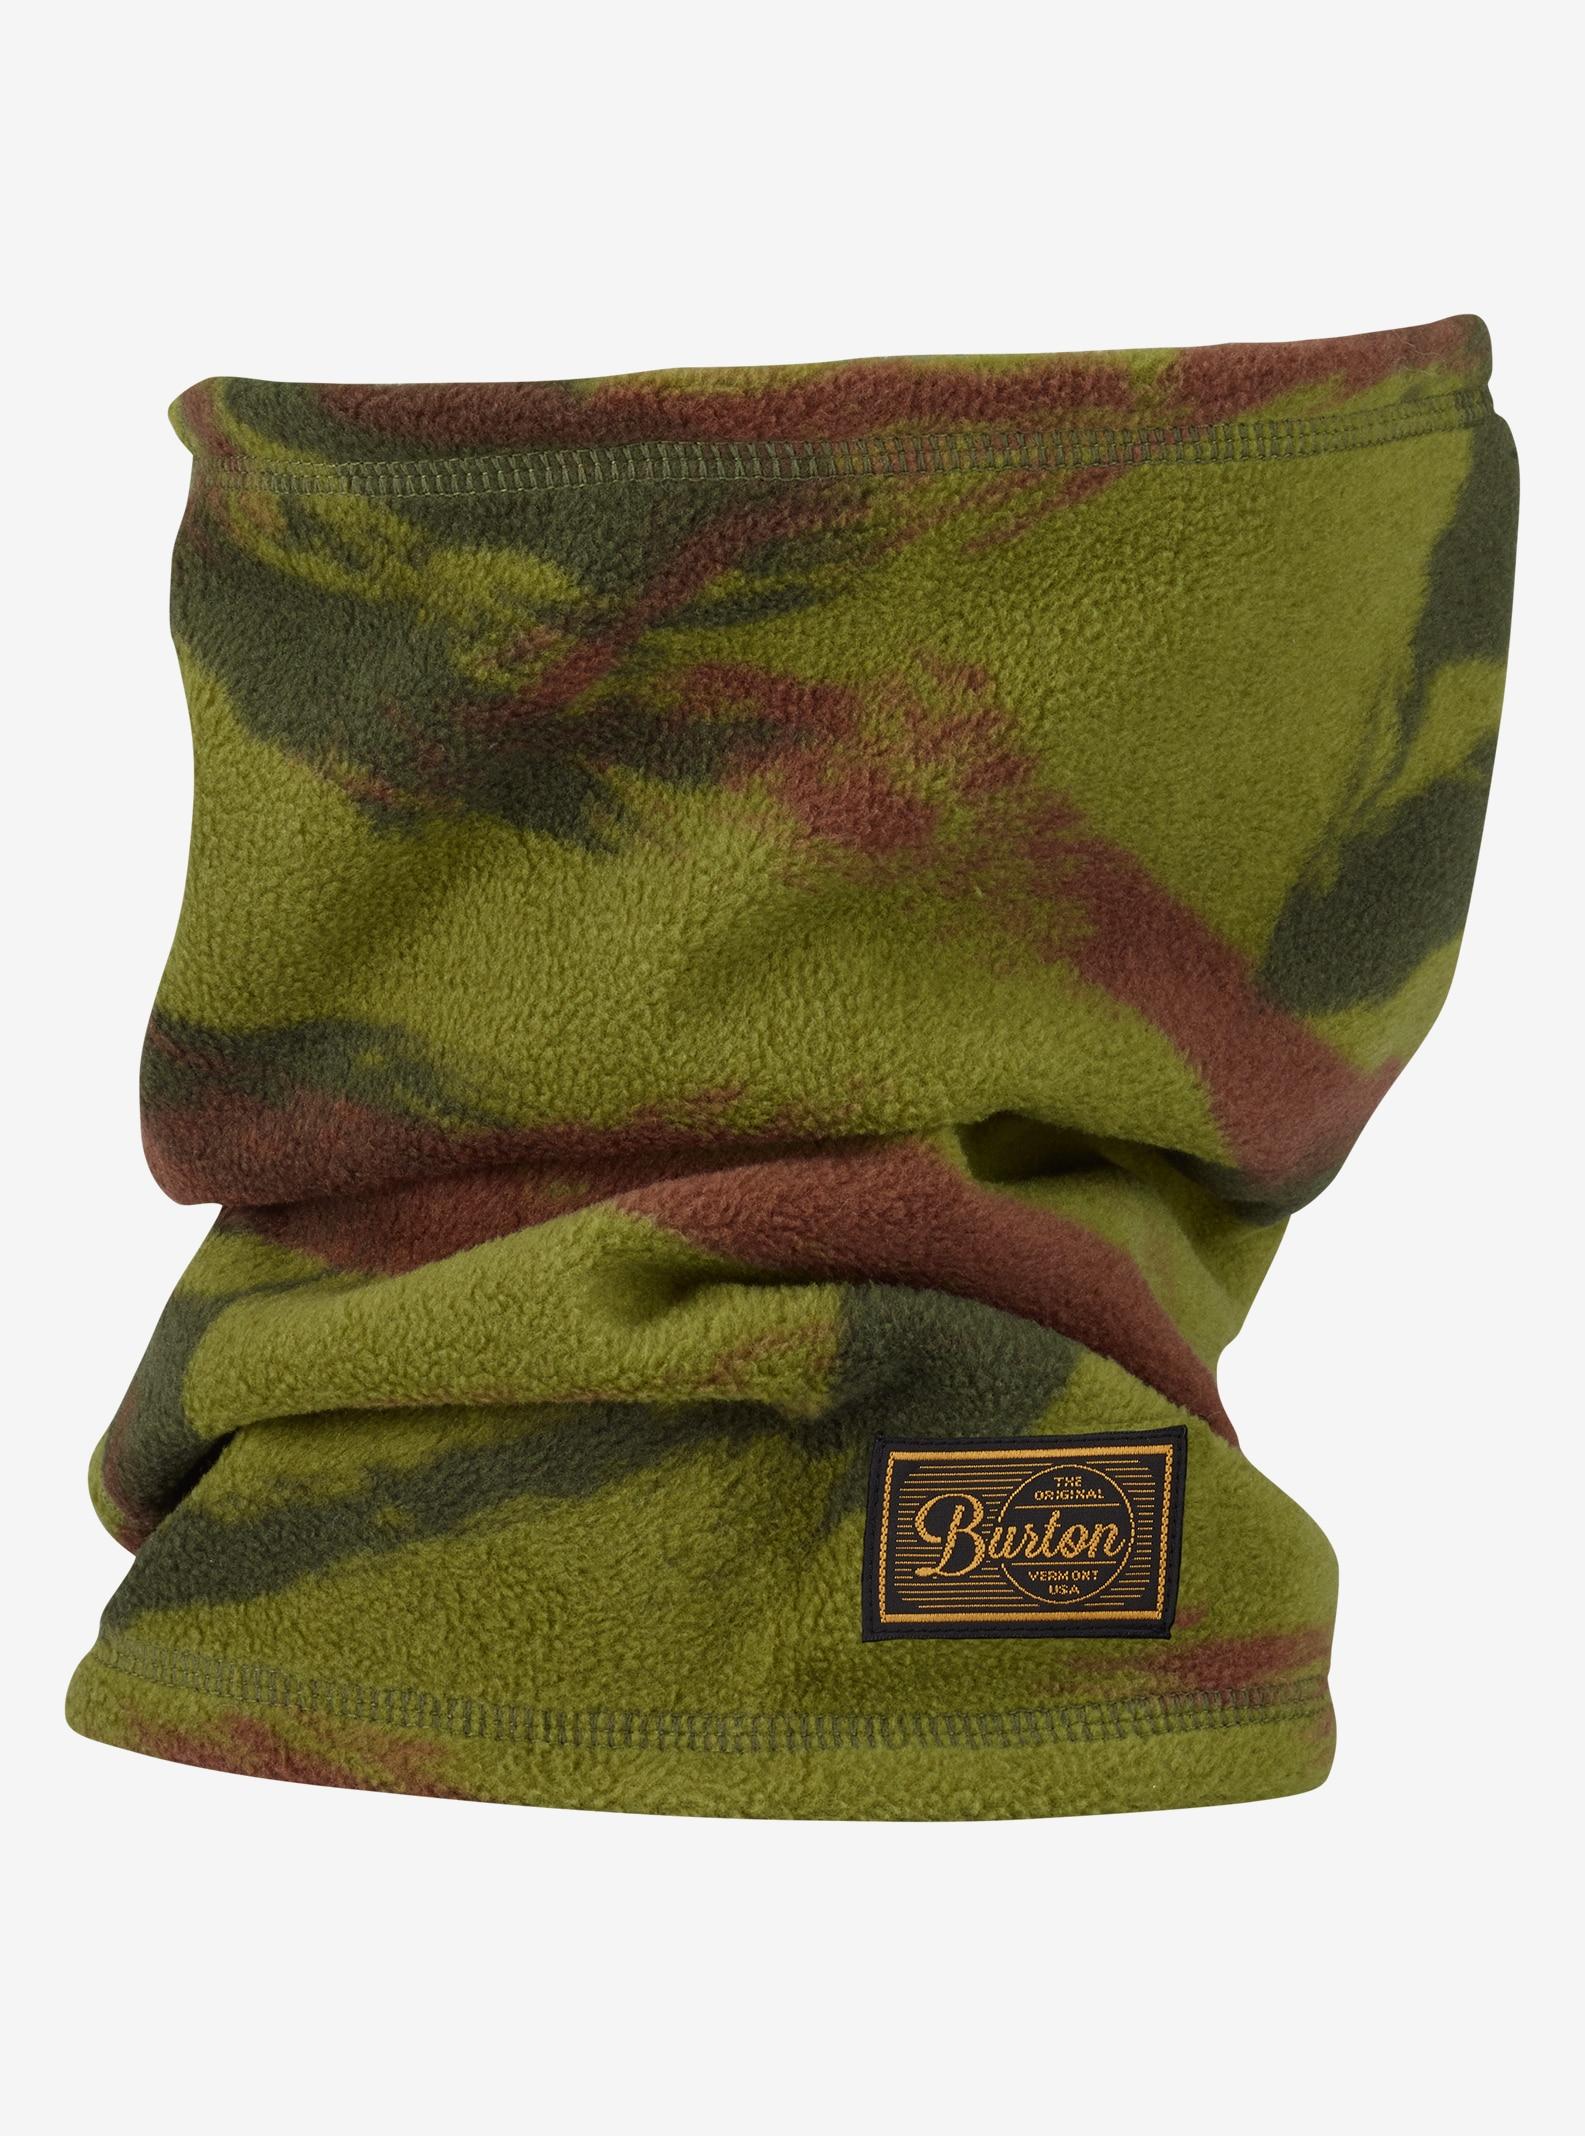 Burton Ember Fleece Neck Warmer shown in Brush Camo